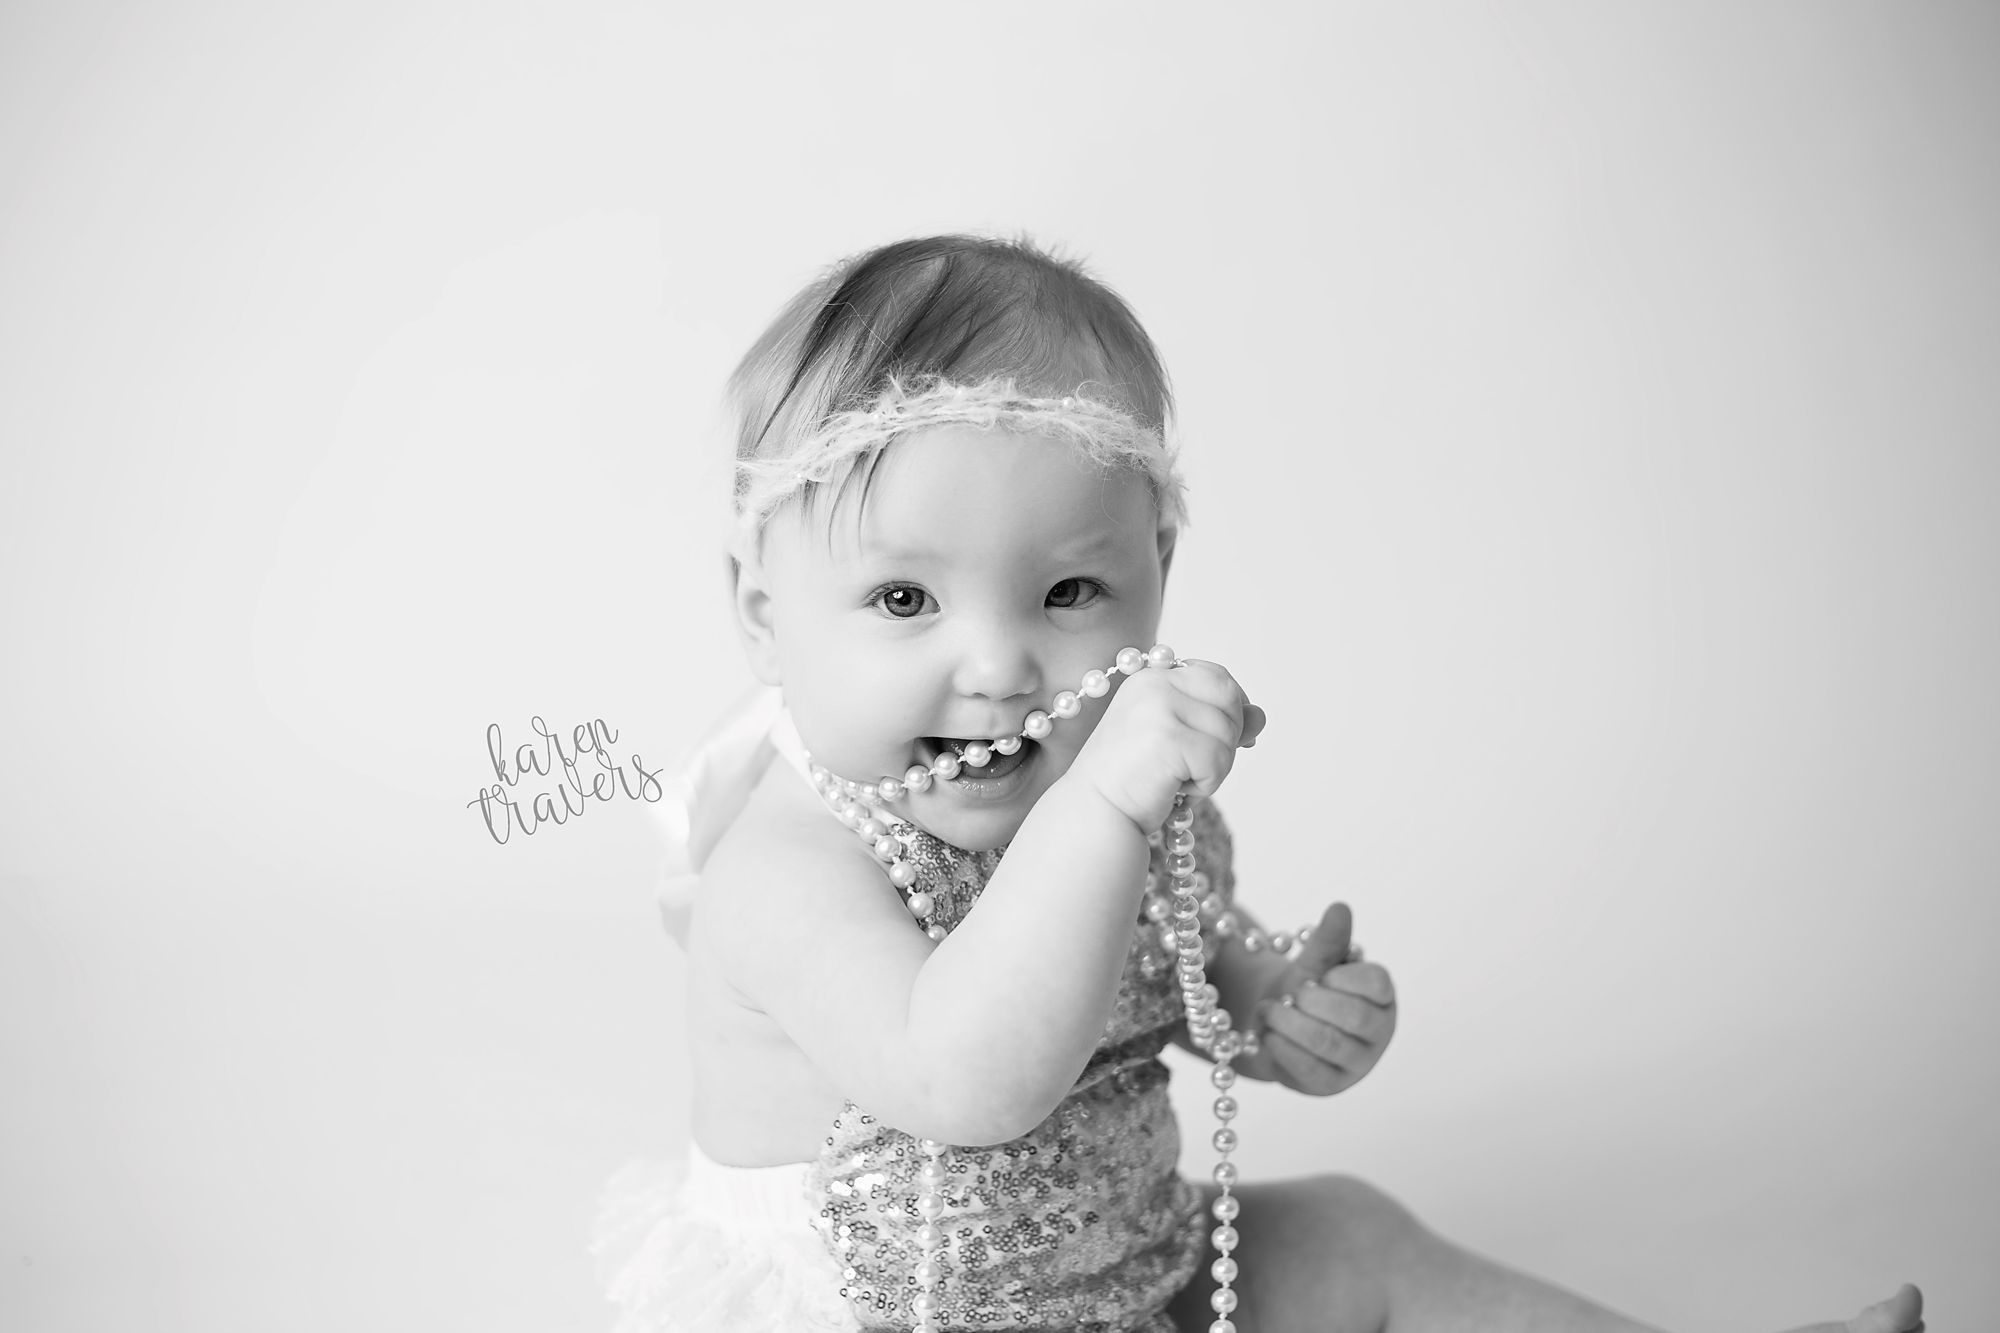 anchorage-newborn-photographer-11.png